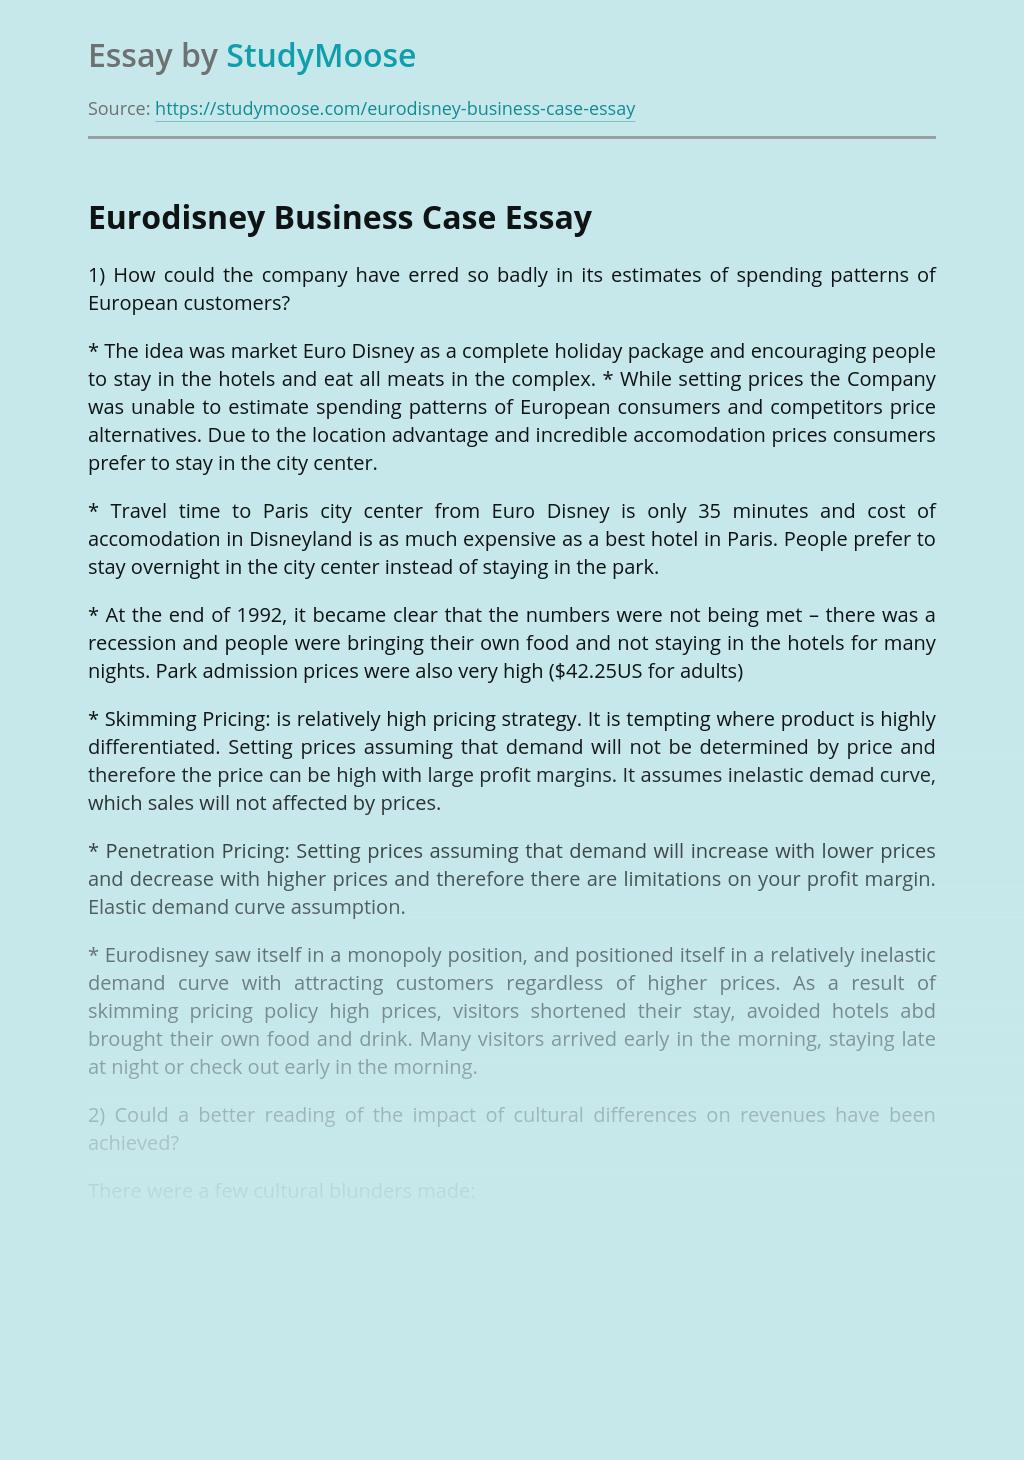 Eurodisney Business Case